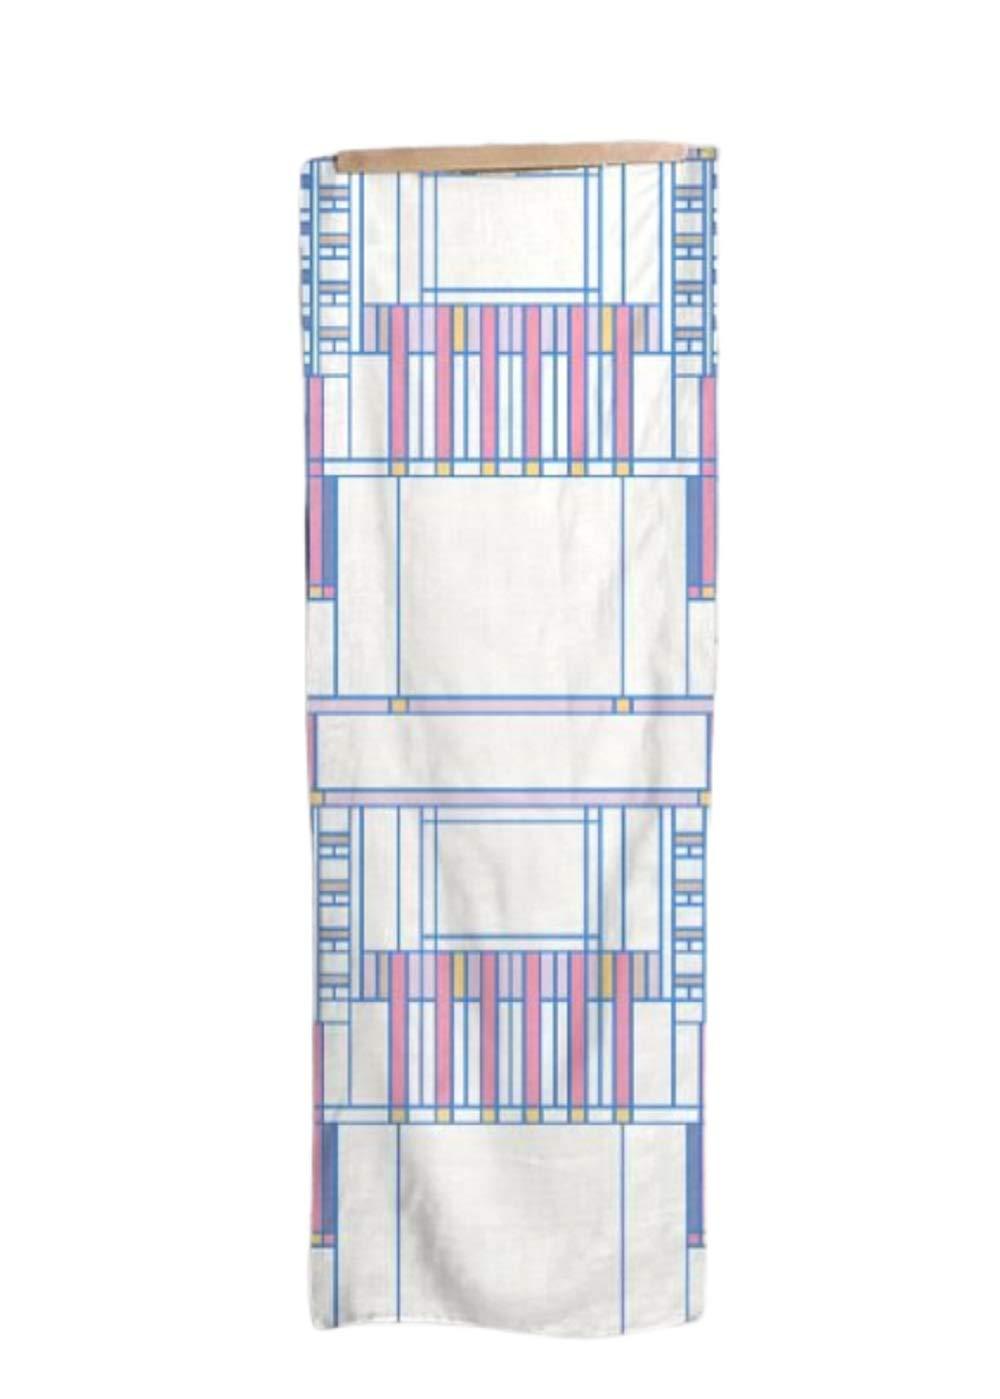 VIDA   Brights on White Modal Scarf (1955 Textile Design - 107)   Original Artwork Designed by Frank Lloyd Wright by VIDA